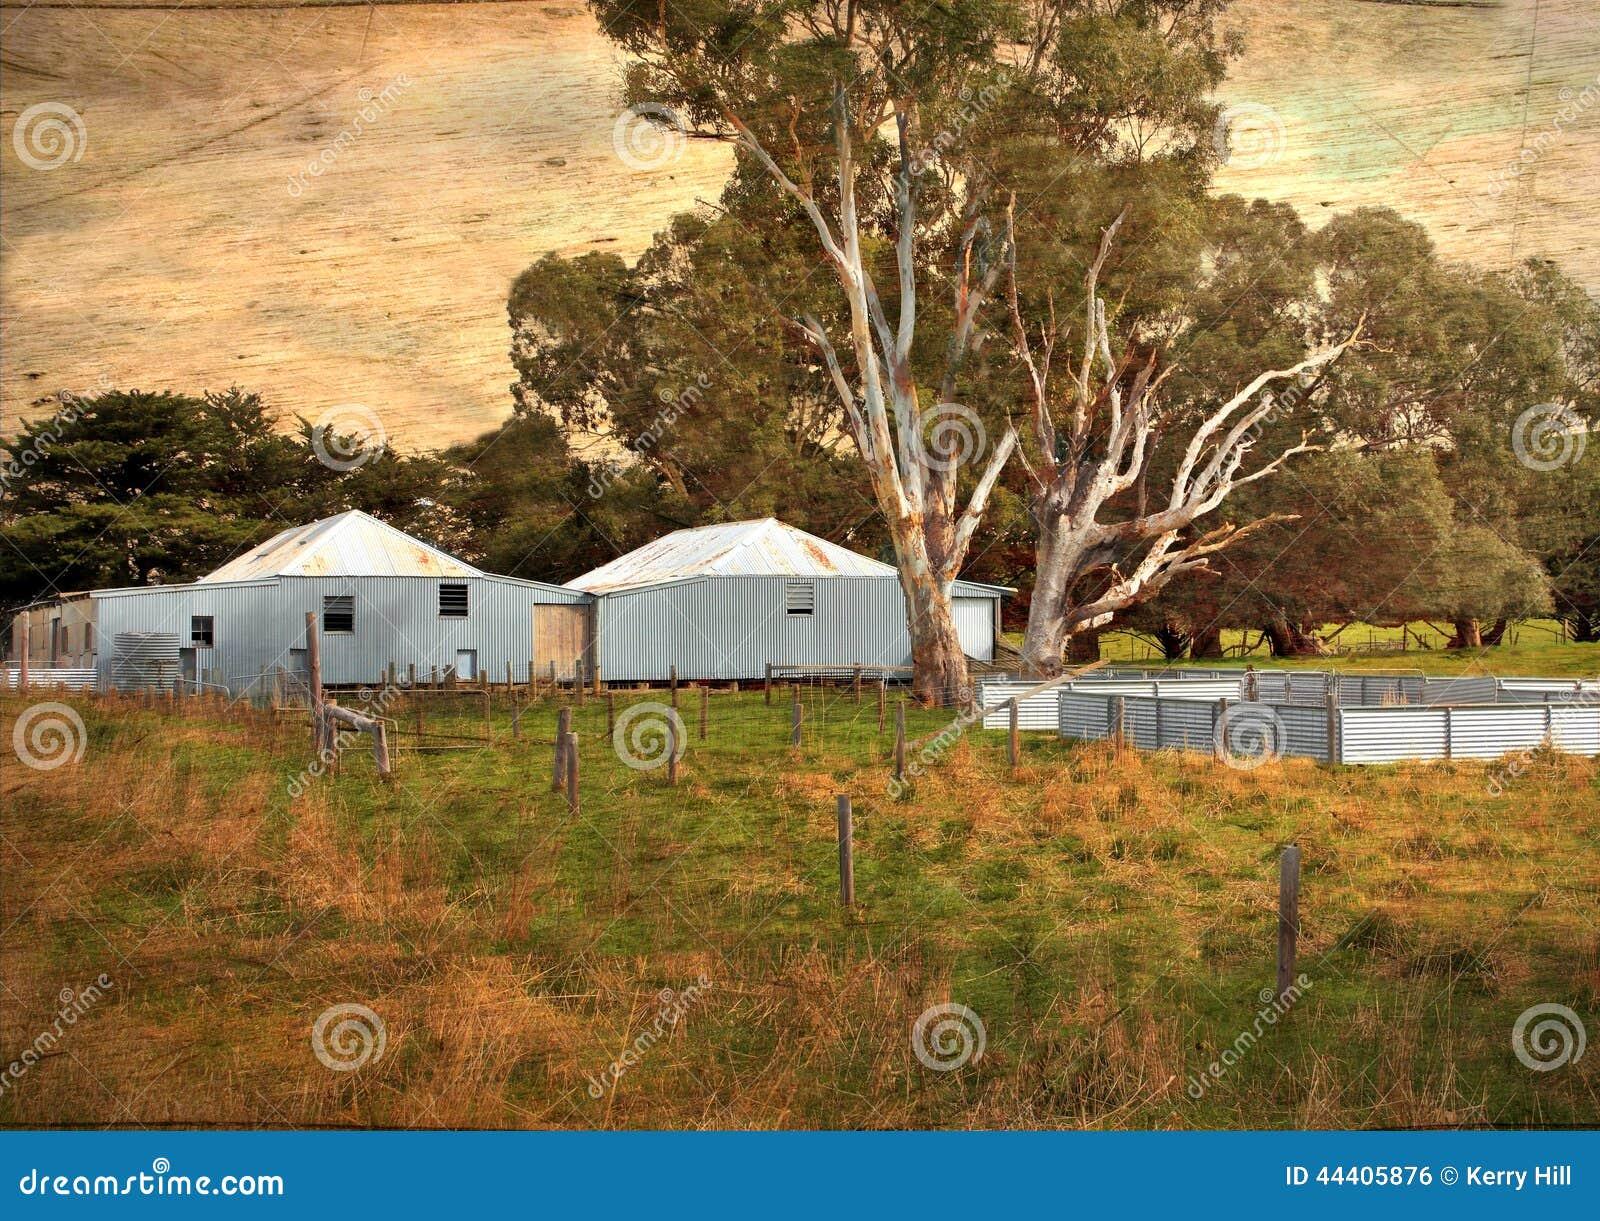 Old Australian Sheep Shearing Sheds Stock Photo Image